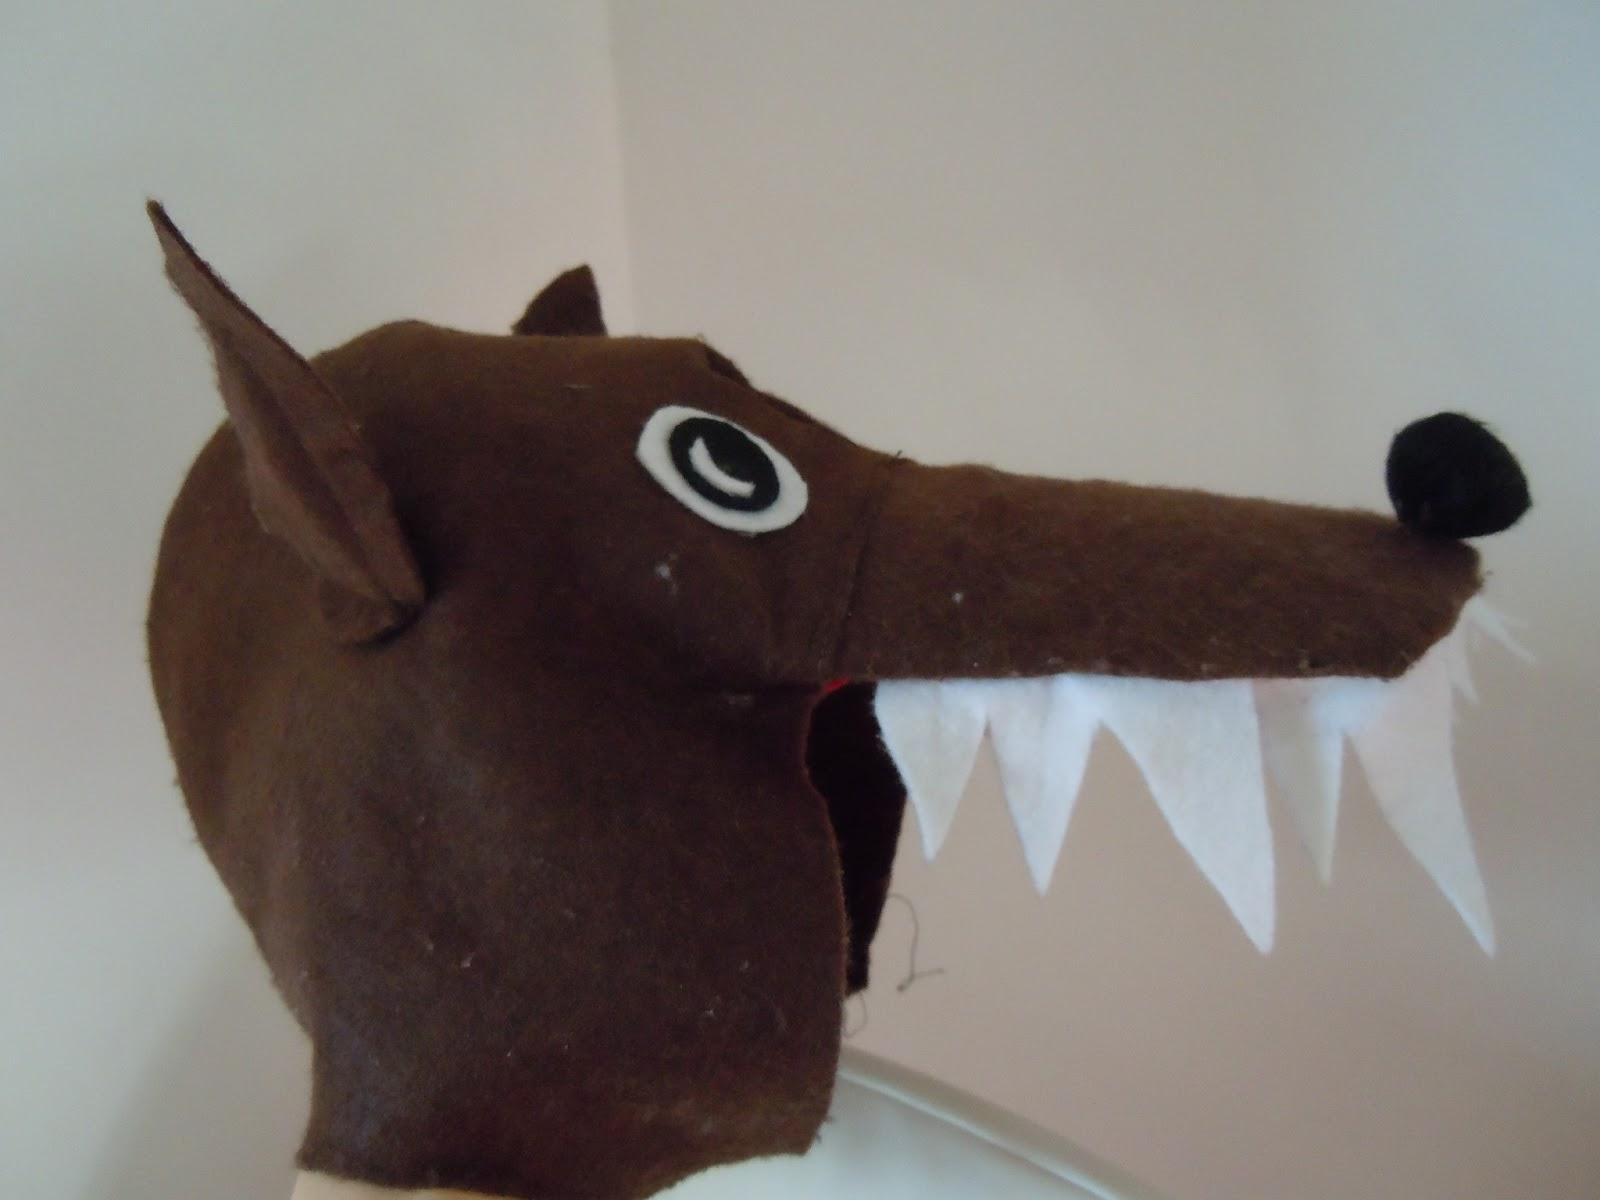 abbastanza Decora Recicla Immagina: Maschera lupocome costruirla! - The Wolf JL42